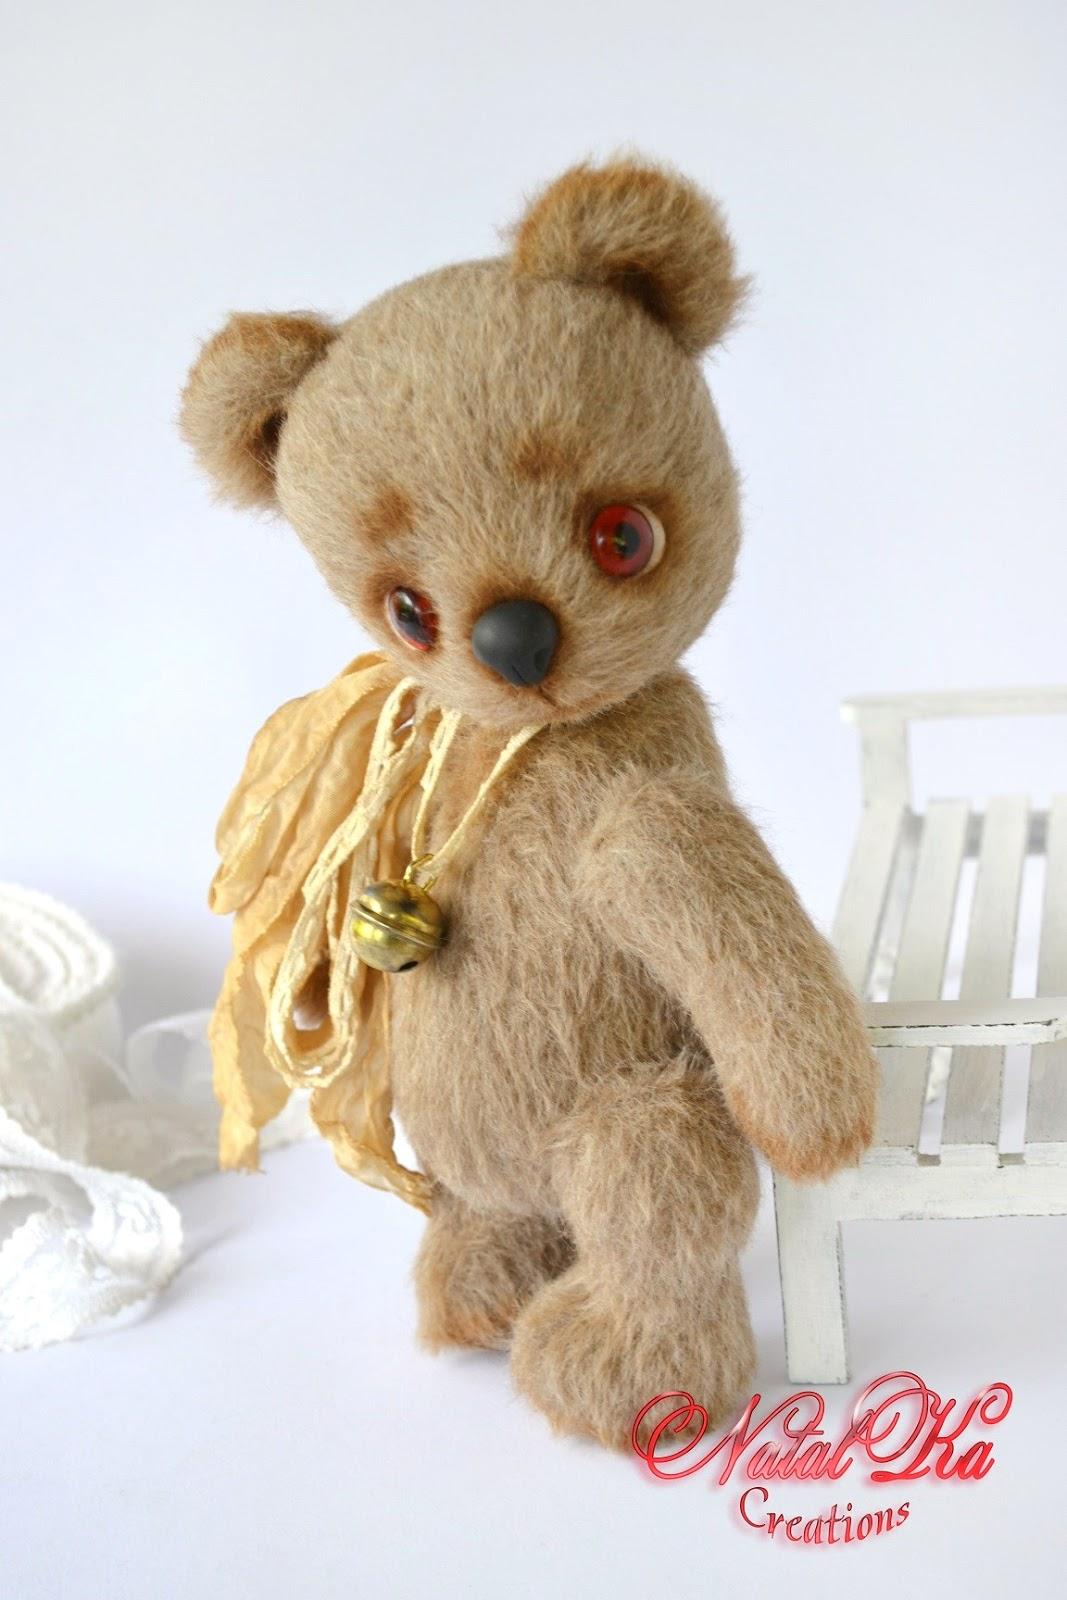 Авторский мишка теди медведь медвежонок из кашемира ручной работы от NatalKa Creations. Künstlerbär Bär Sammlerbär Teddybär Teddy Unikat handgemacht von NatalKa Creations. Artist teddy bear ooak handmade by NatalKa Creations